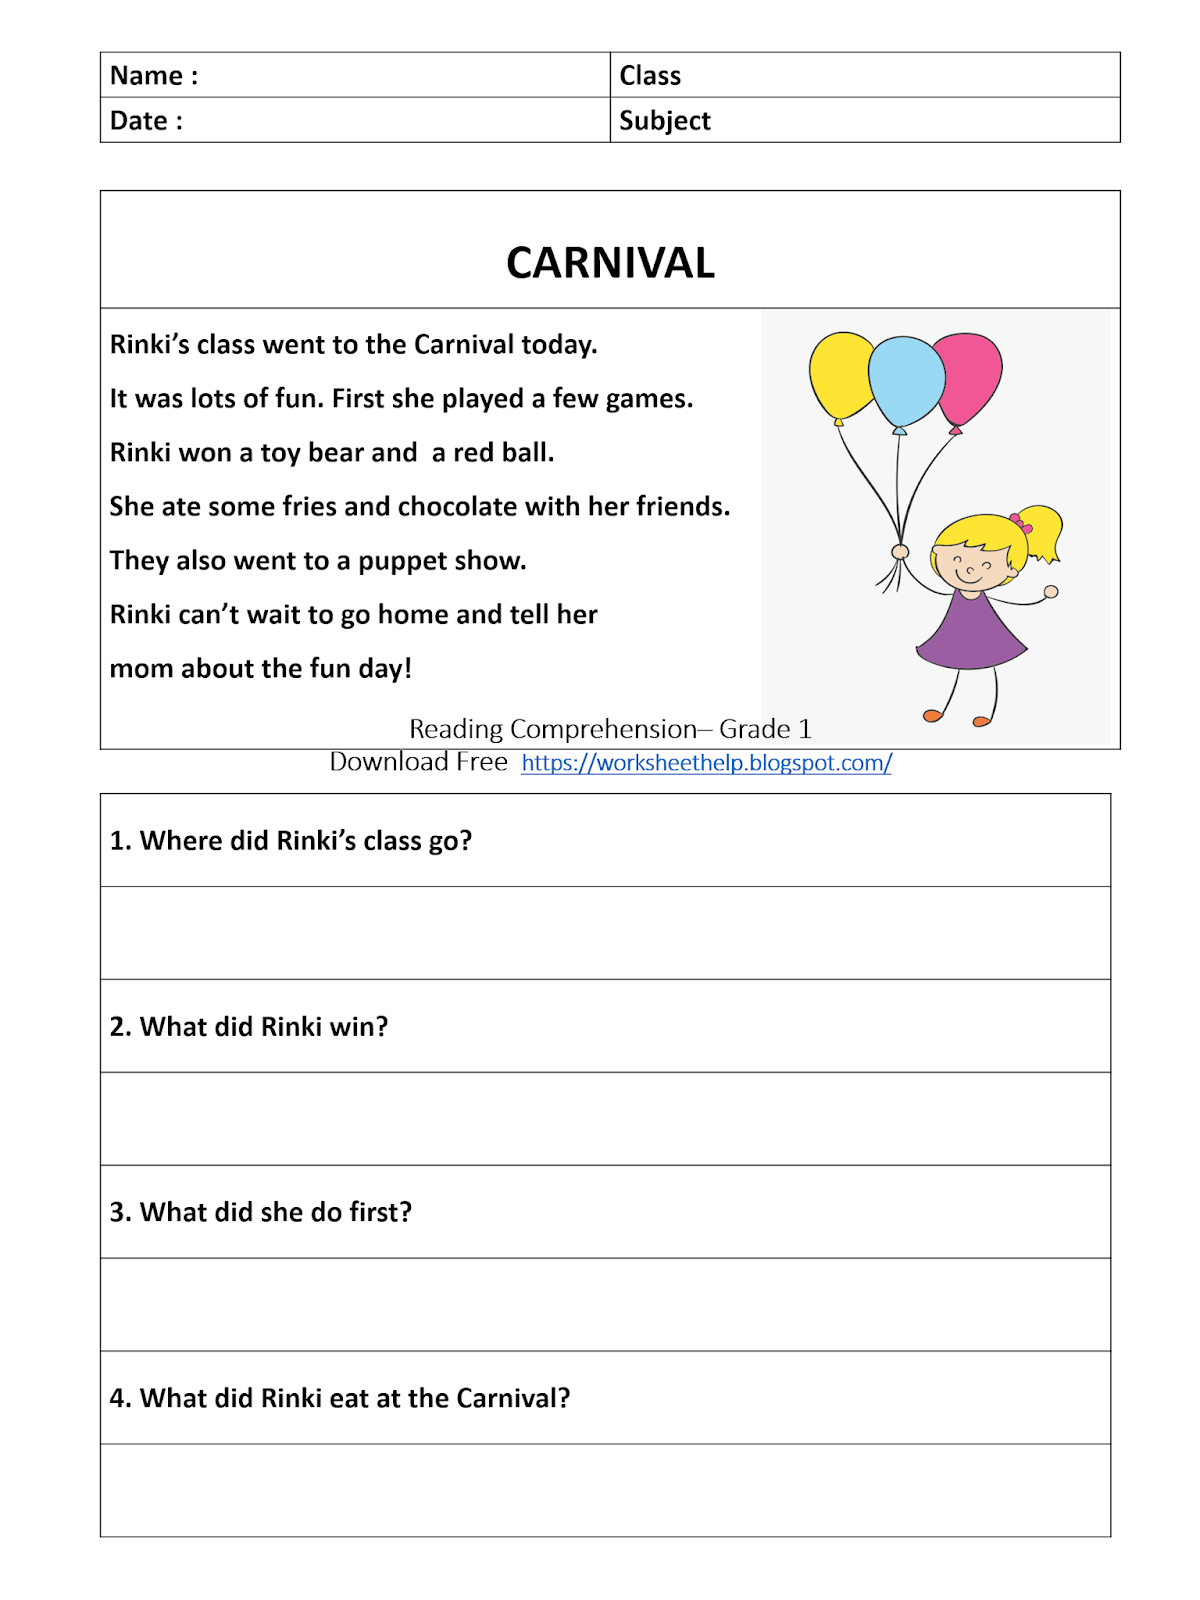 medium resolution of Clipart Creationz: Reading Comprehension Worksheet - Grade 1 - Carnival